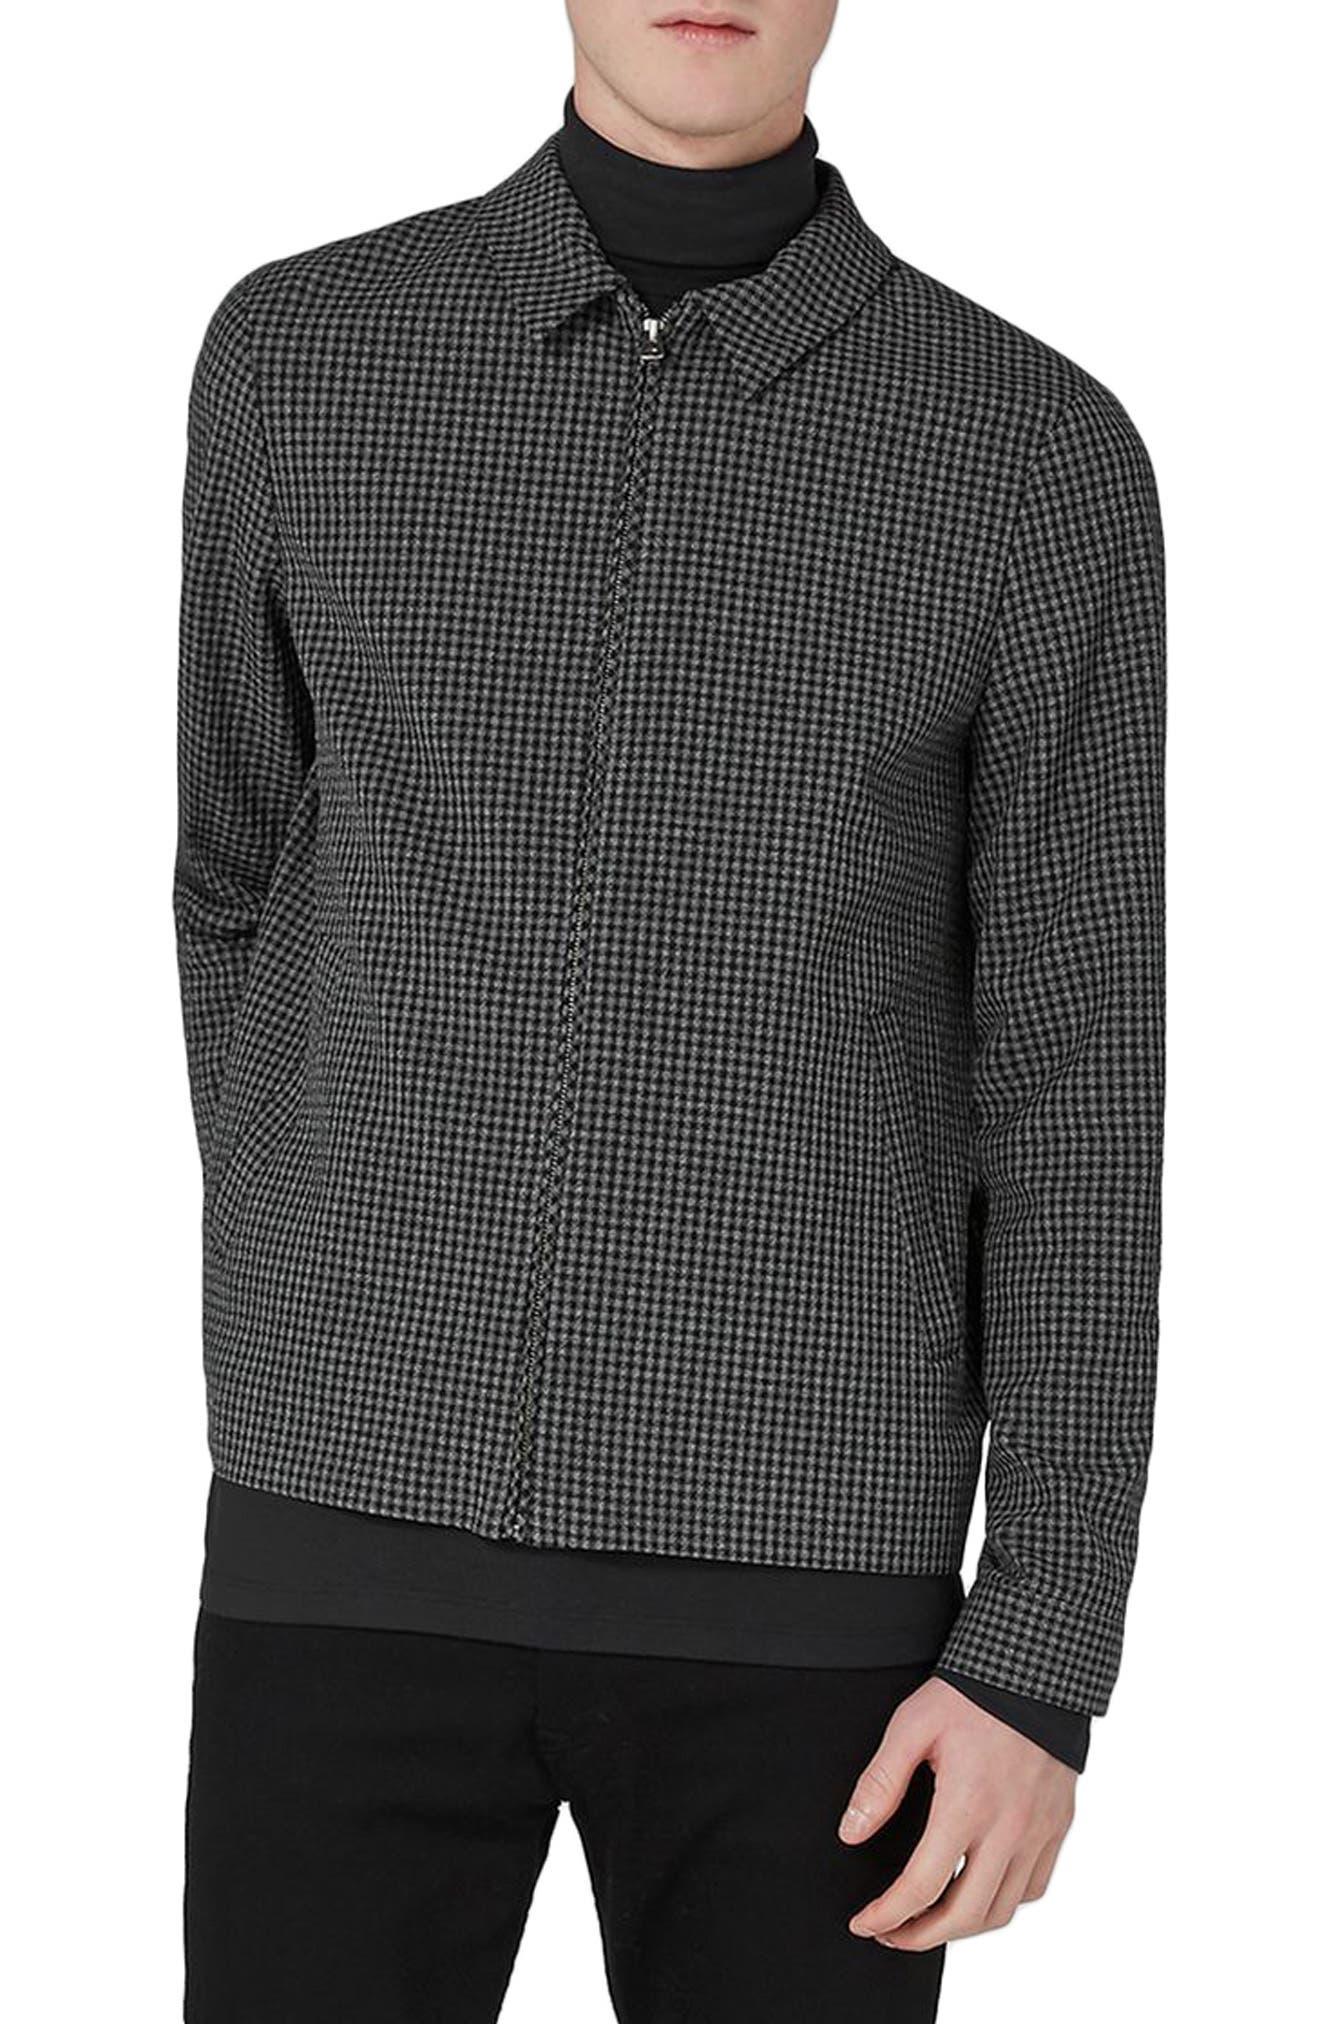 Gingham Harrington Jacket,                             Main thumbnail 1, color,                             020